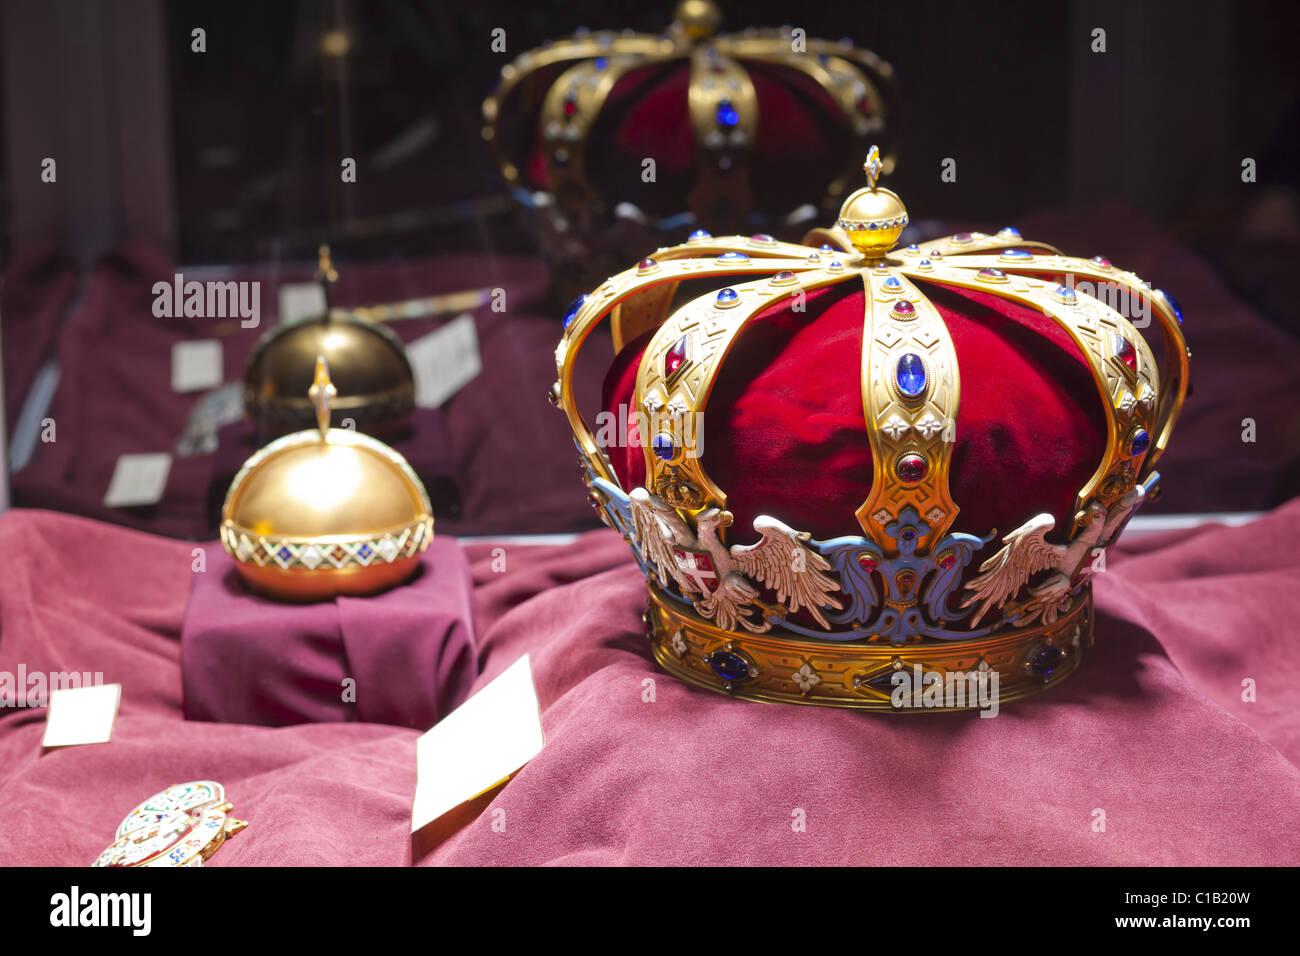 Serbian Royal Crown Insignia - Stock Image